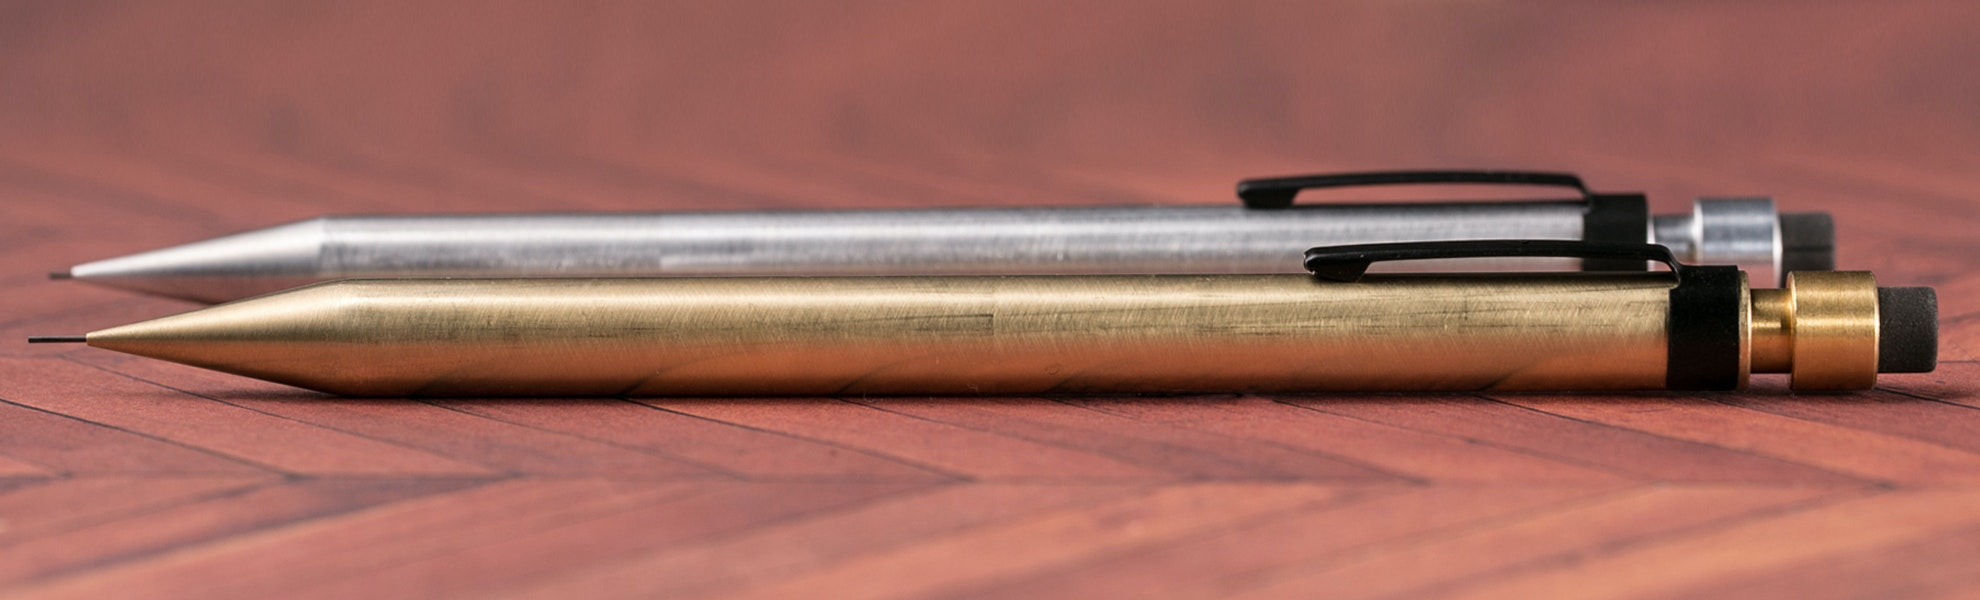 "Modern Fuel ""Lifetime"" Mechanical Pencils"